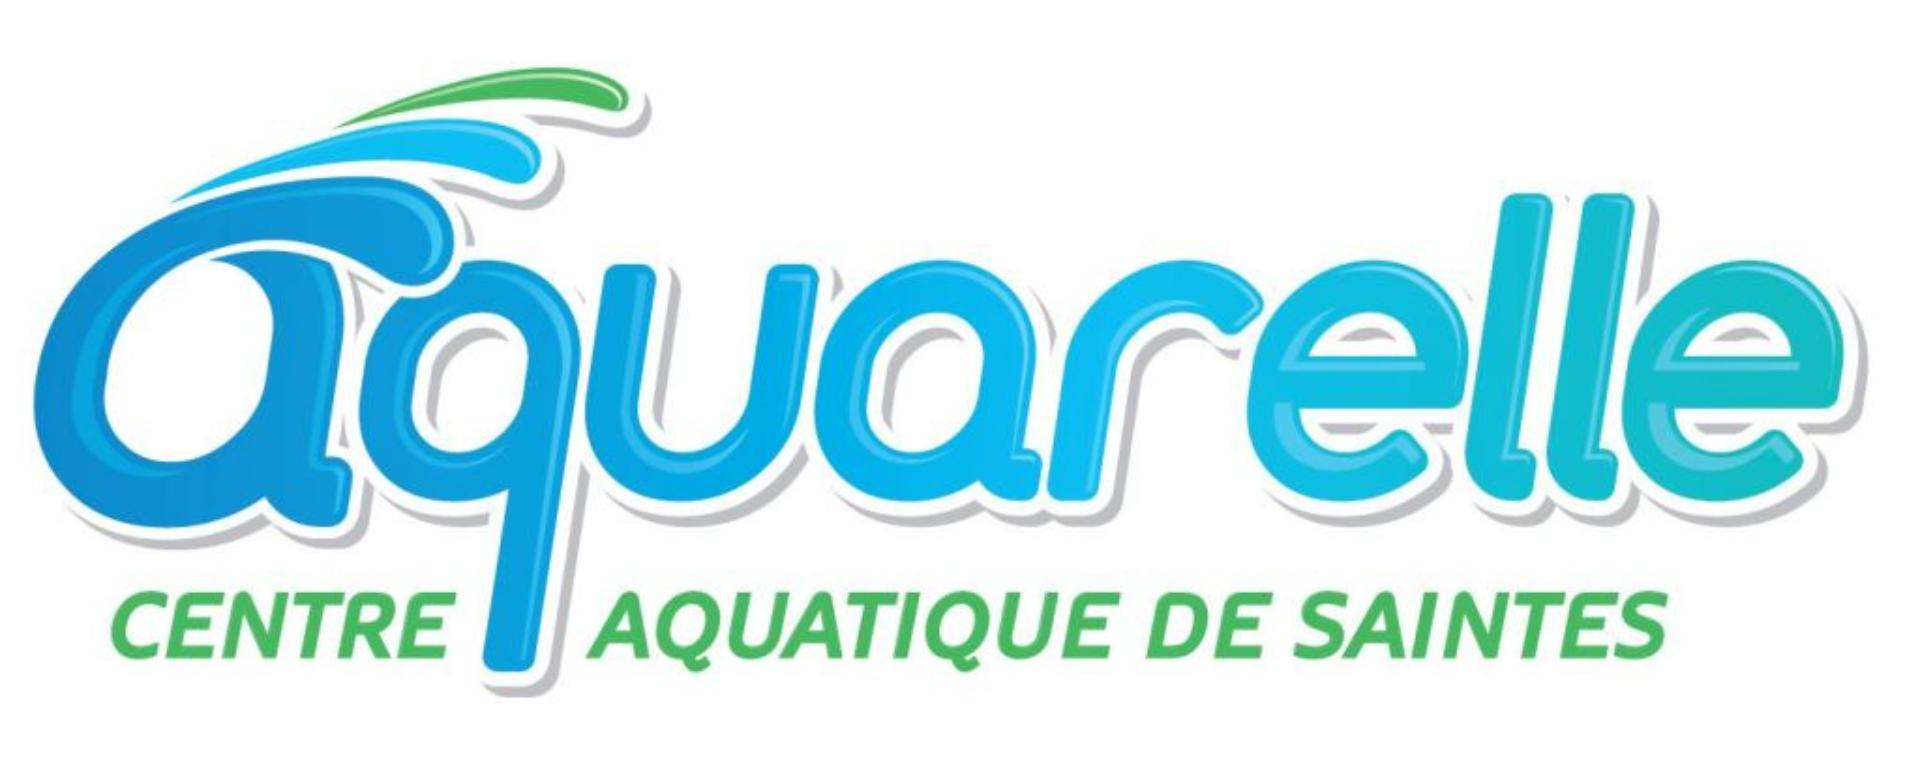 Centre Aquatique Saintes